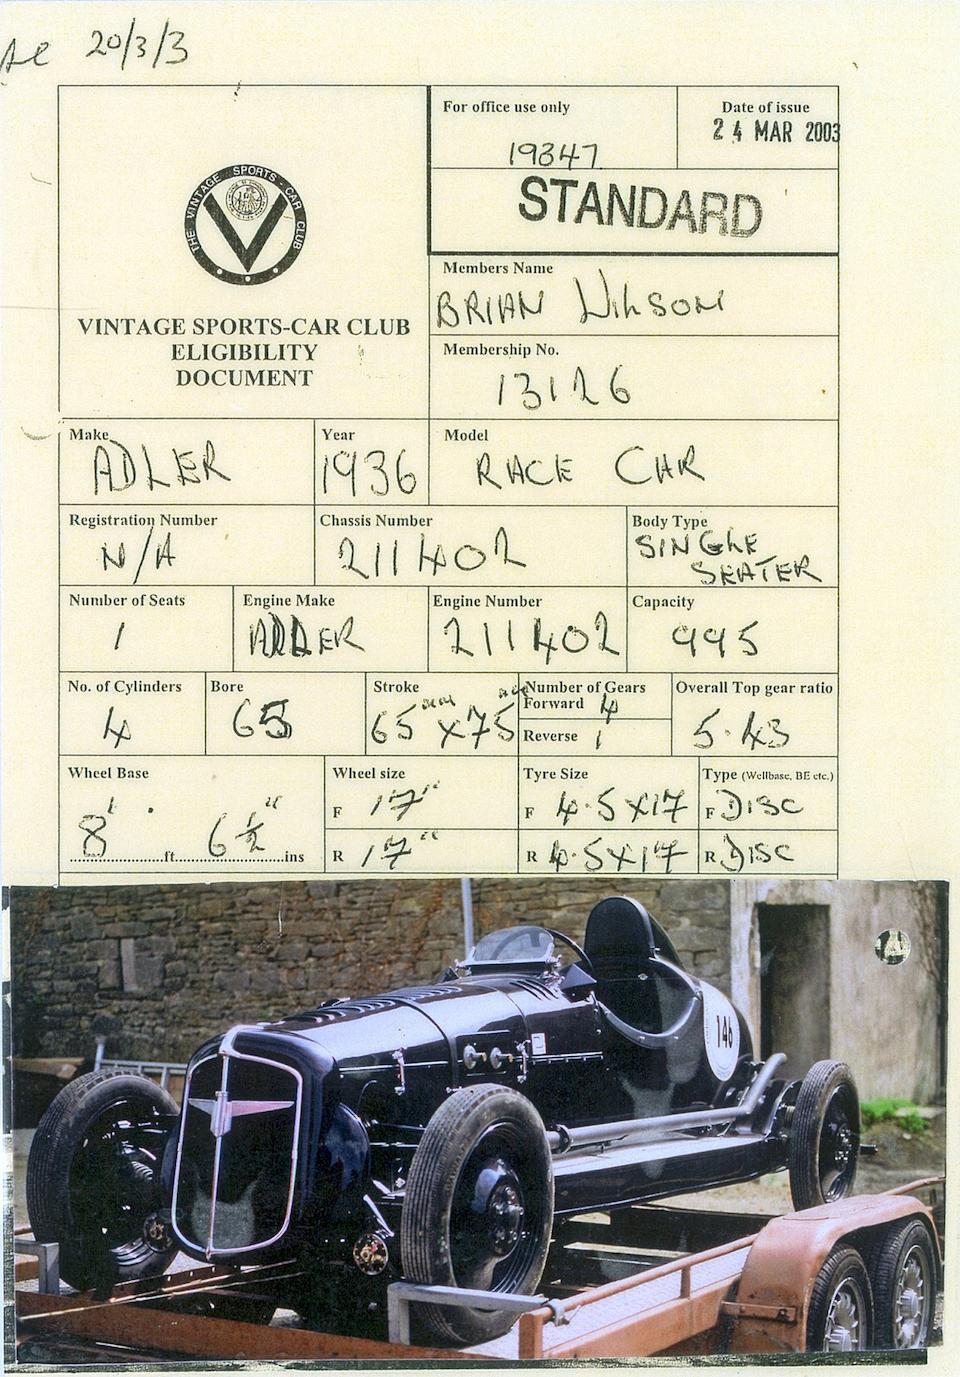 The ex-Charlie Manders,1936 Adler Monoposto  Chassis no. 211402 Engine no. 211402